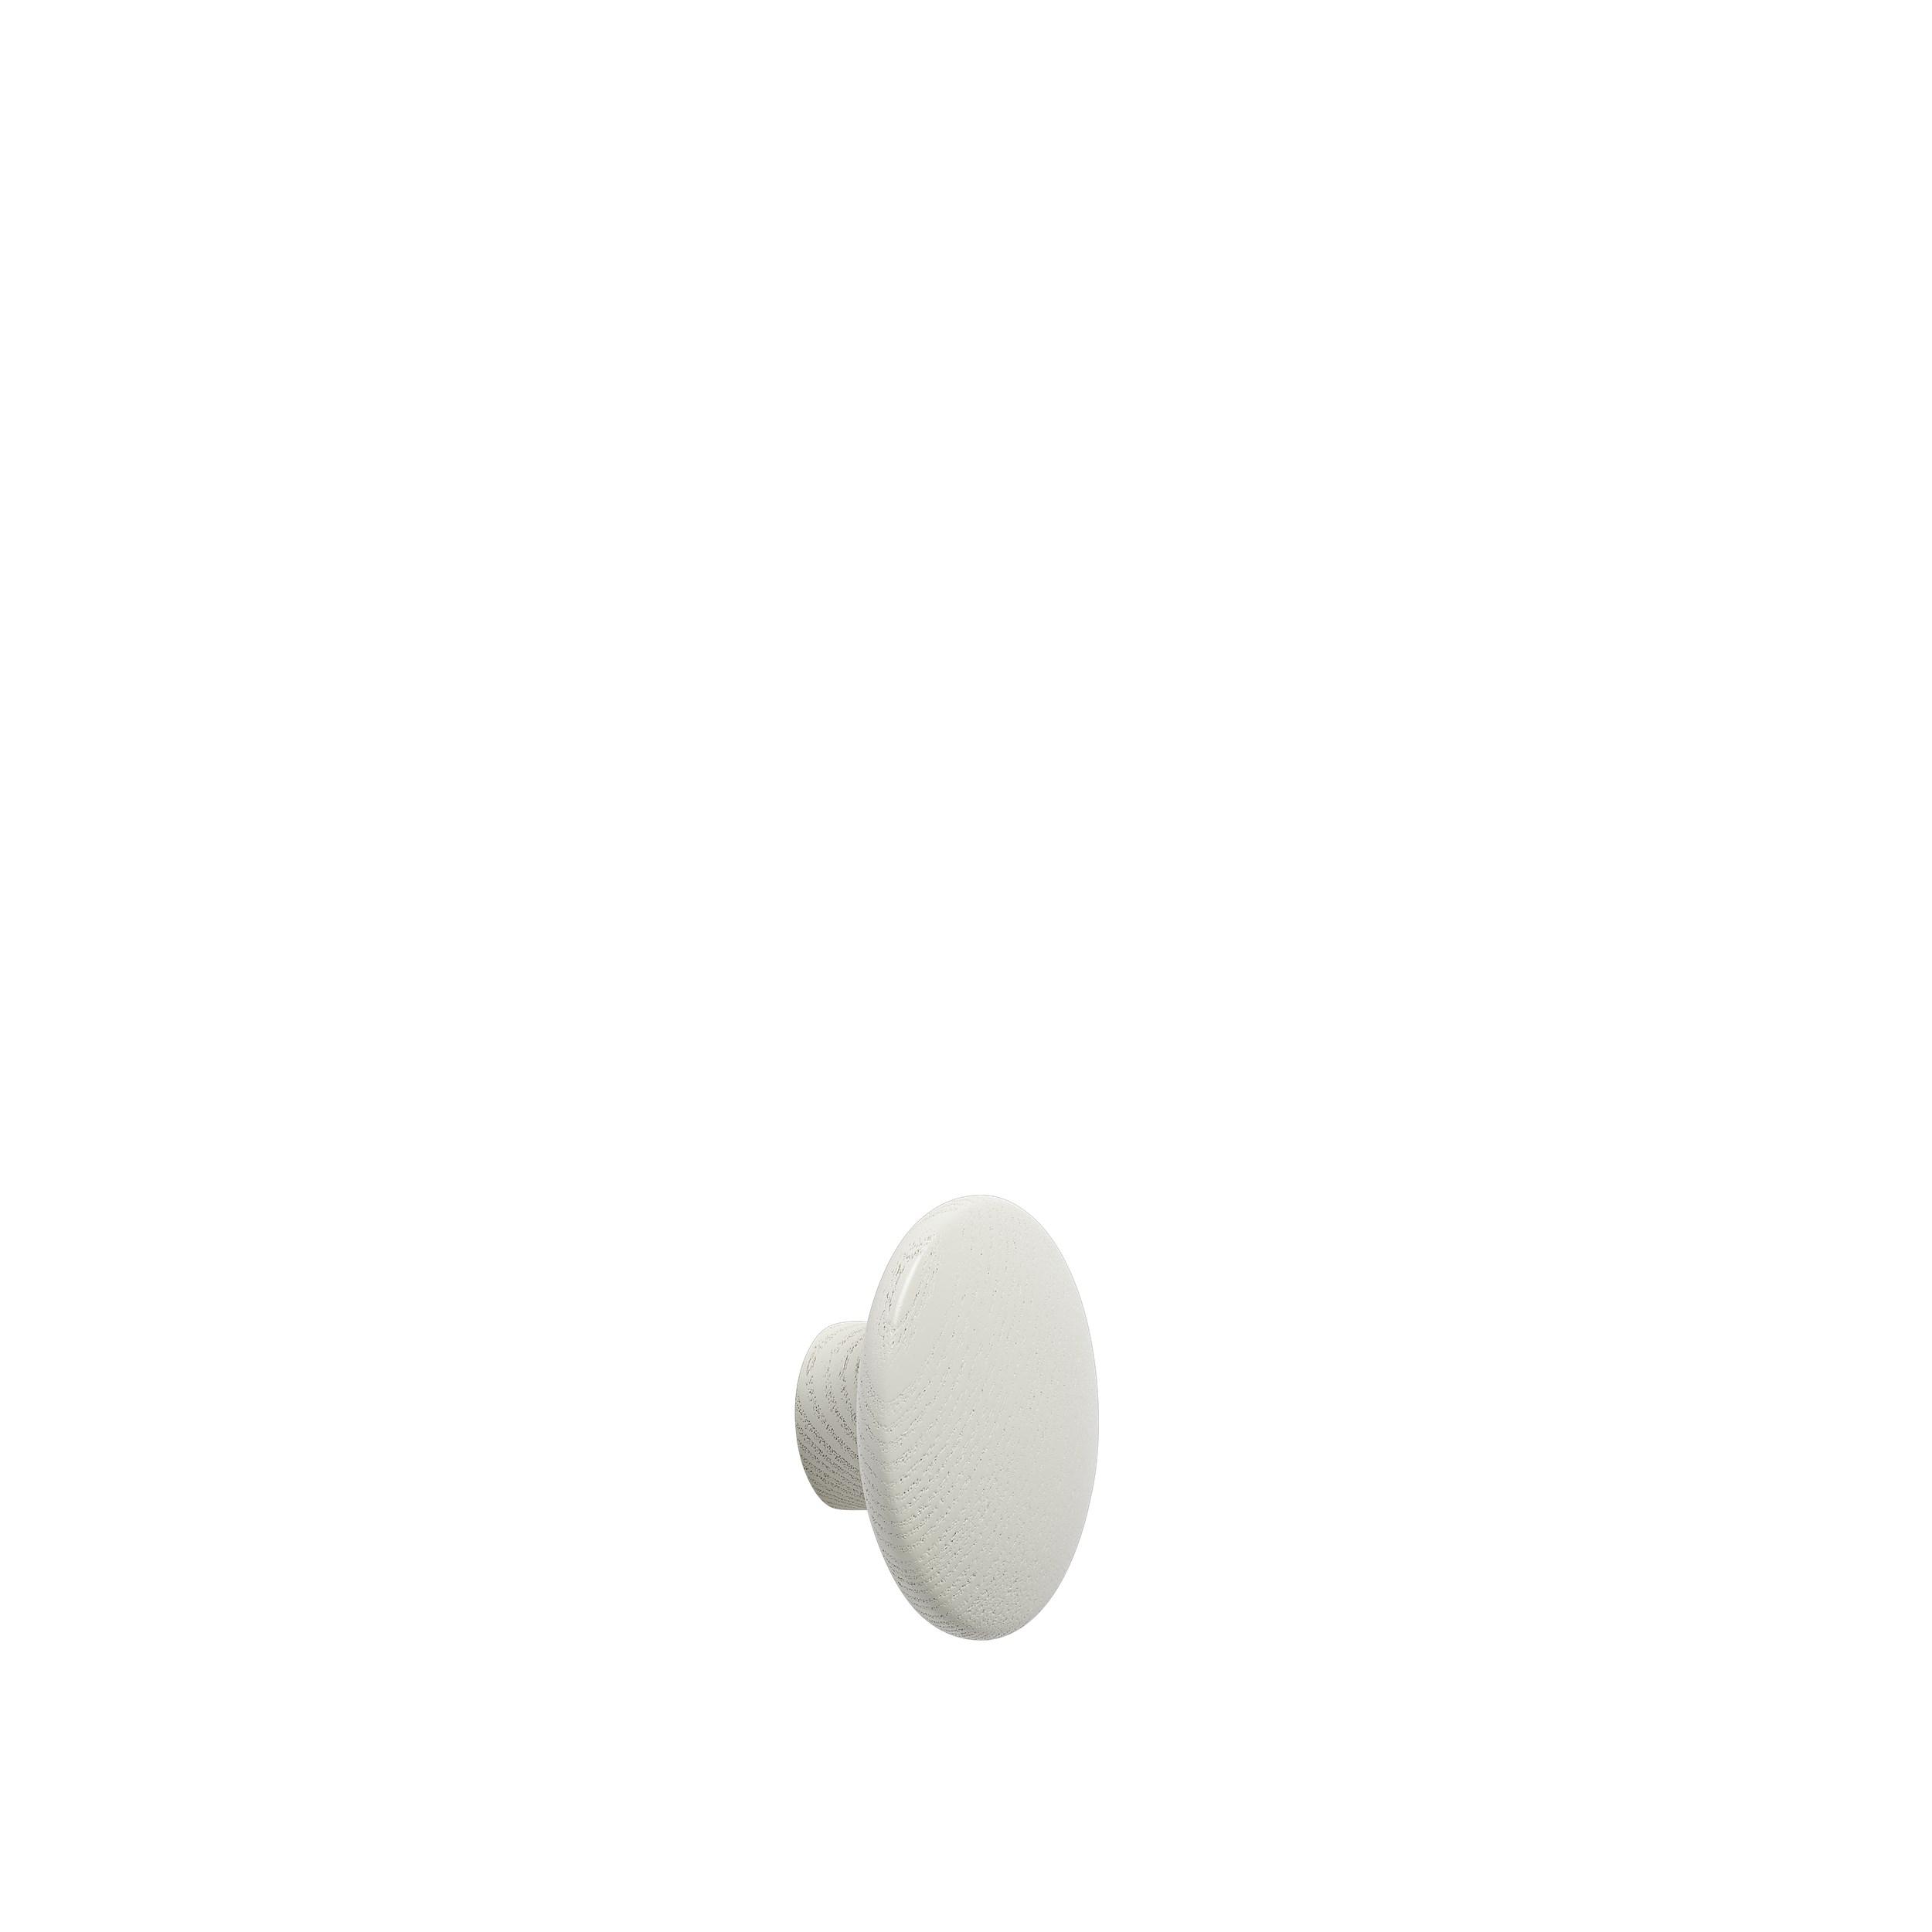 Dot wood X-small Ø 6,5 cm off-white